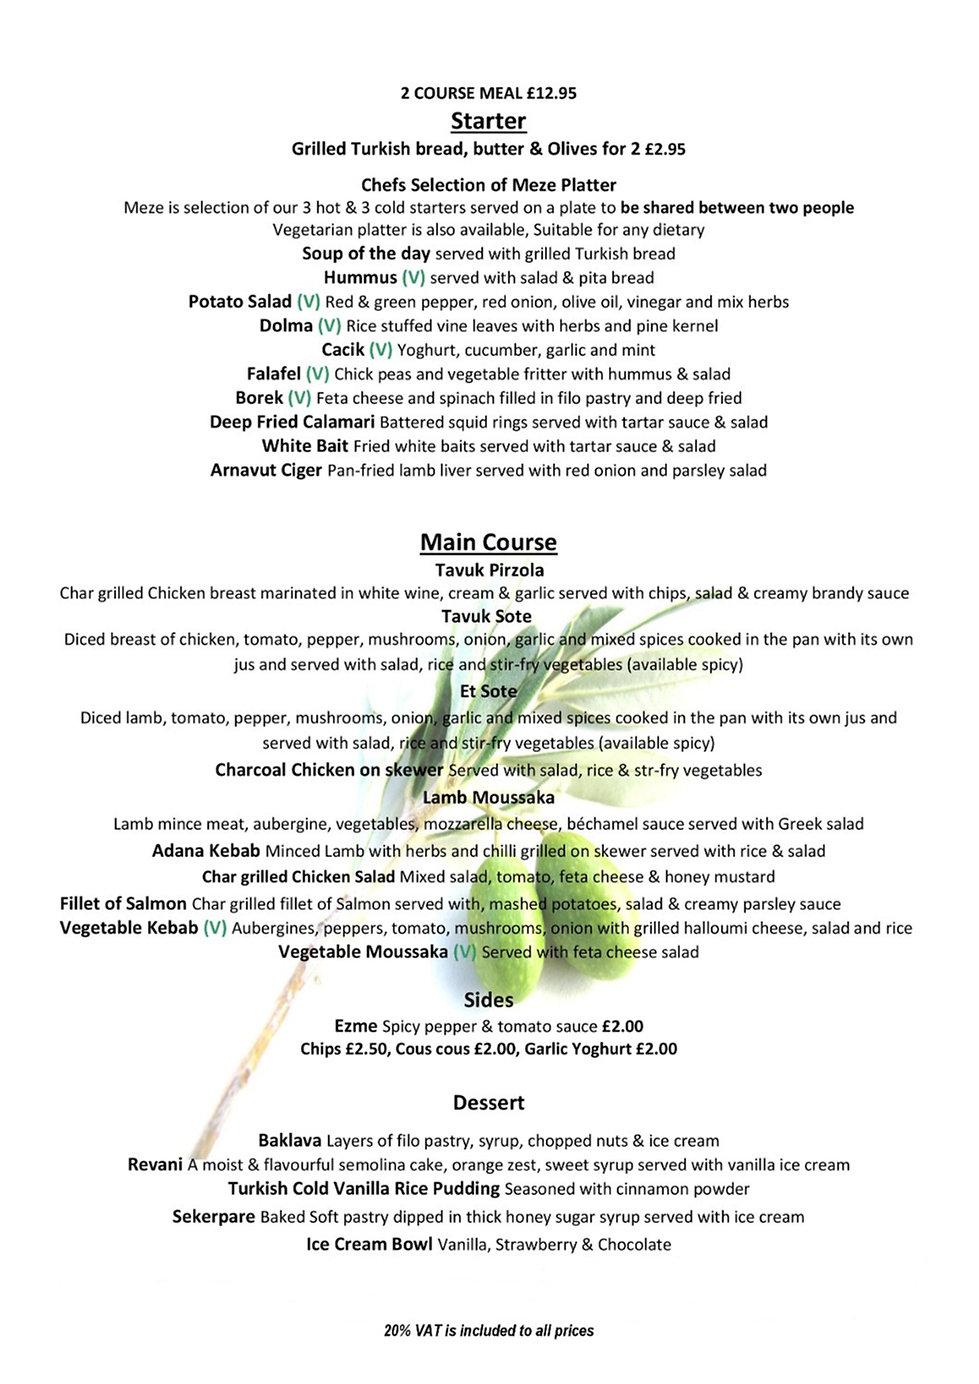 Green Olive Bridgwater Meal Deal Menu